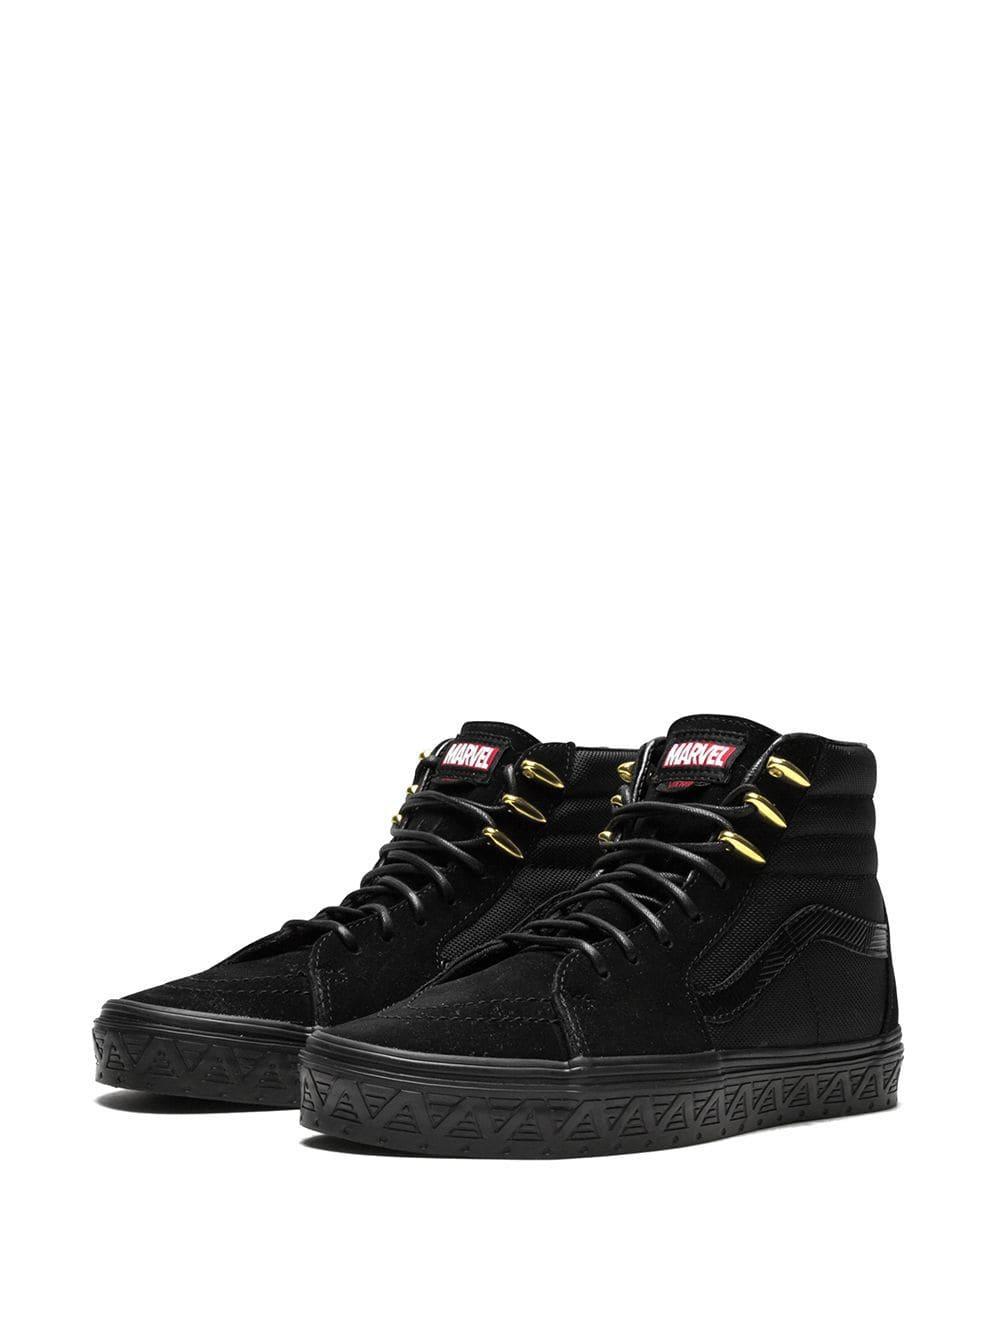 e3329a6614e6d0 Lyst - Vans X Marvel Sk8-hi Sneakers in Black for Men